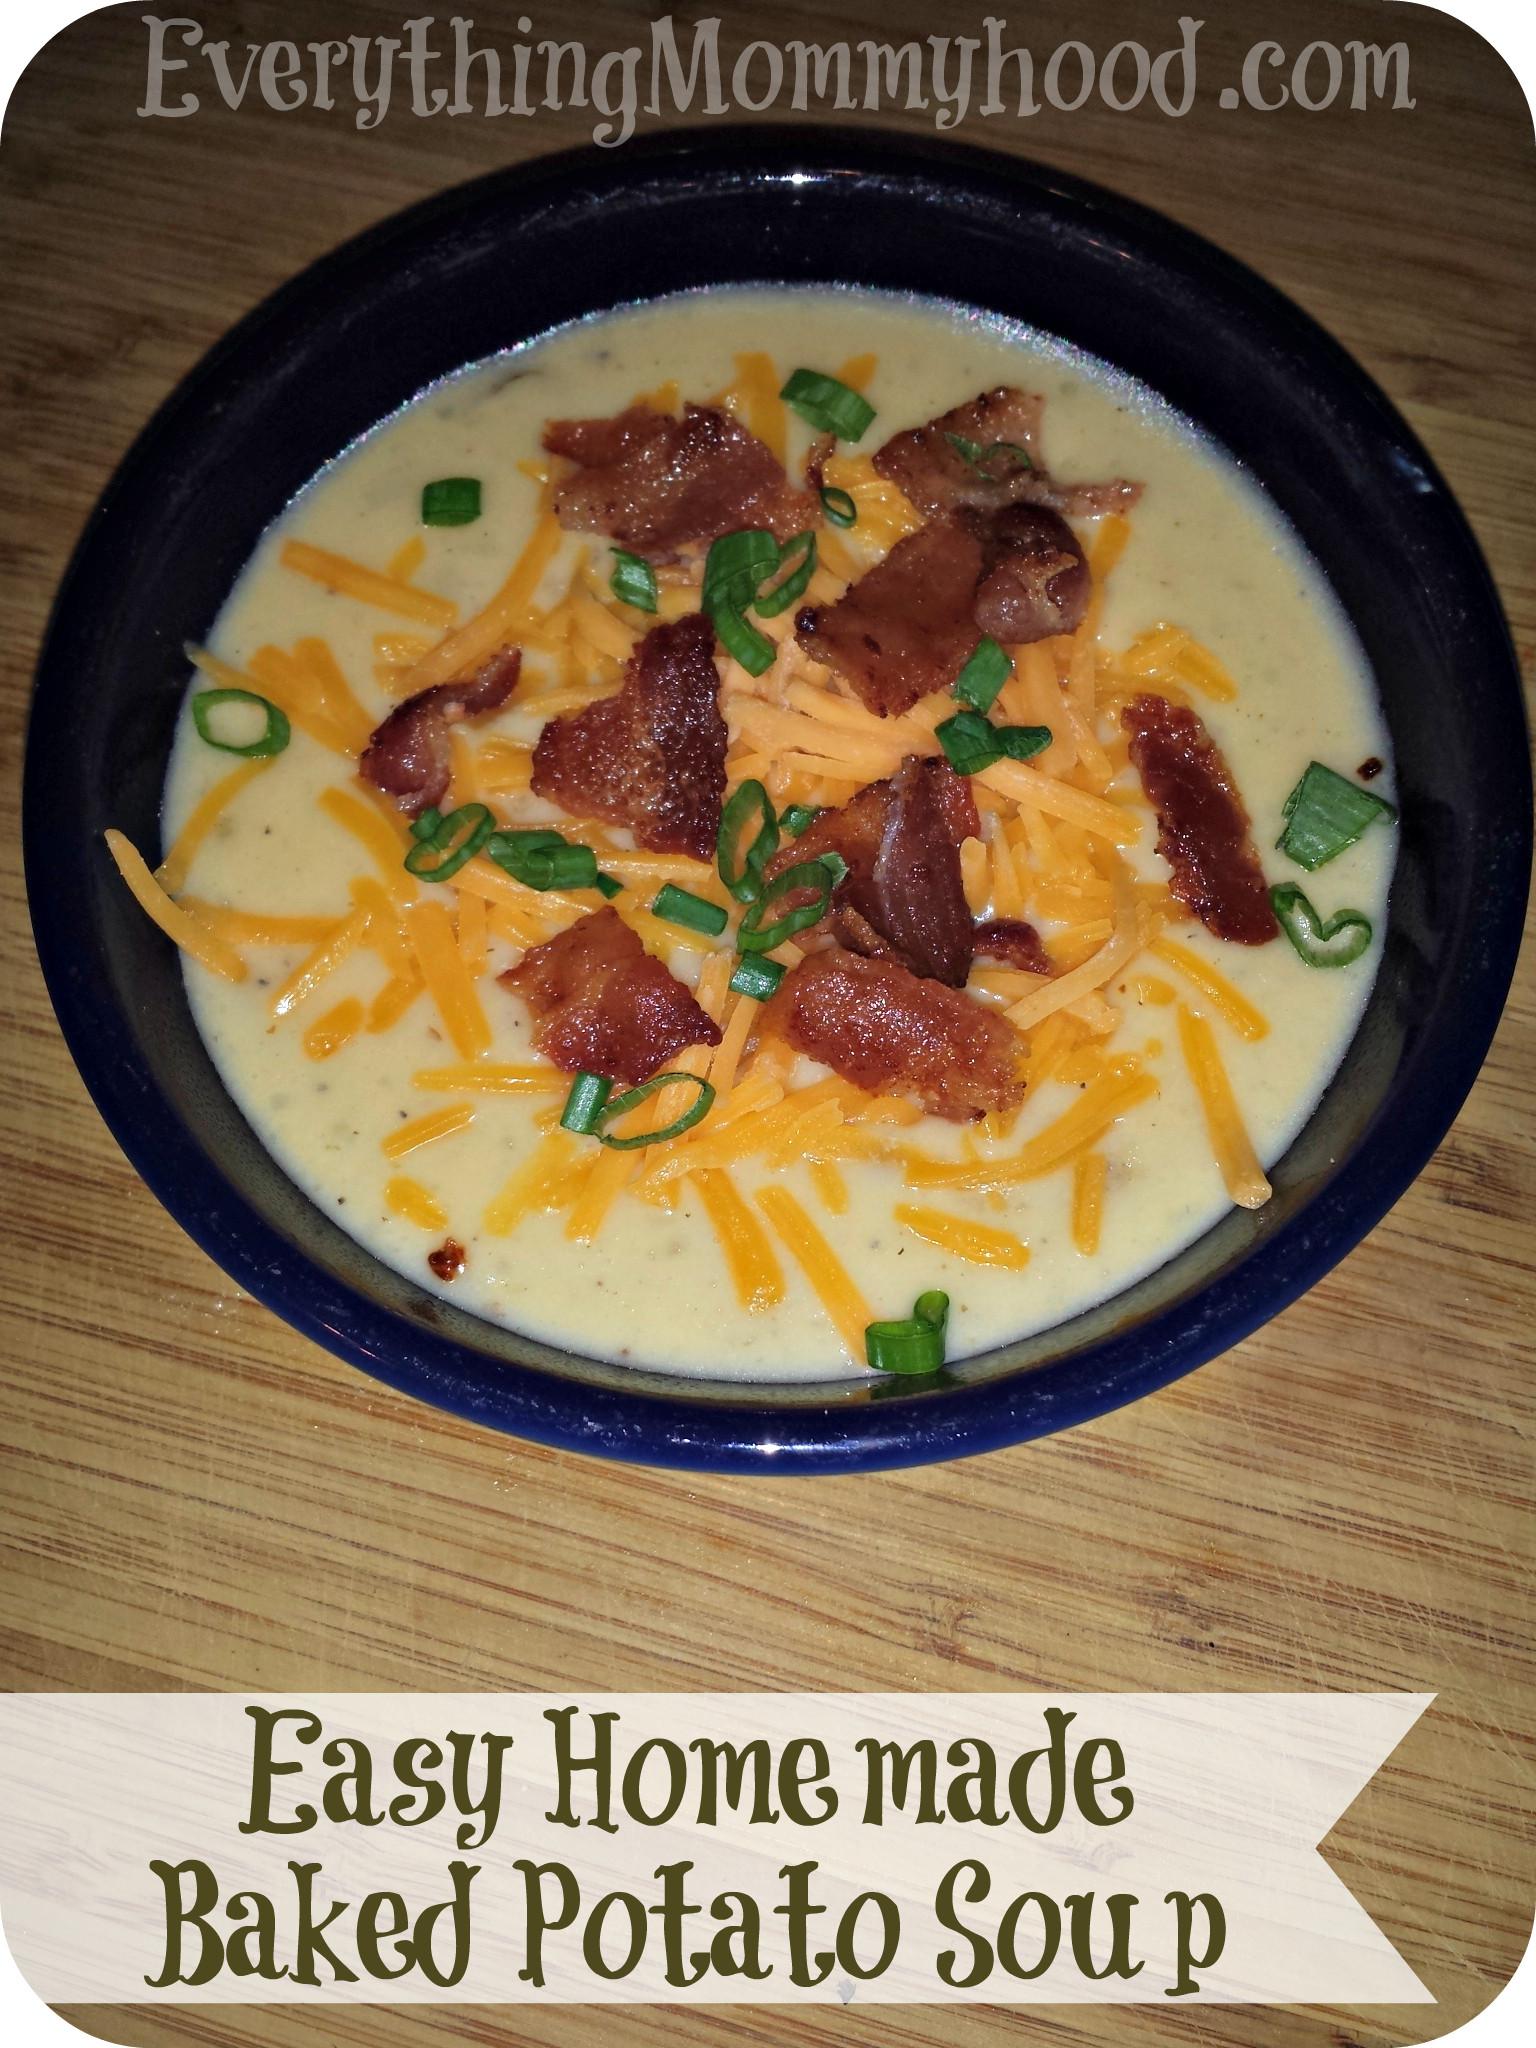 Baked Potato Soup Recipe  Recipe Easy Homemade Baked Potato Soup Everything Mommyhood